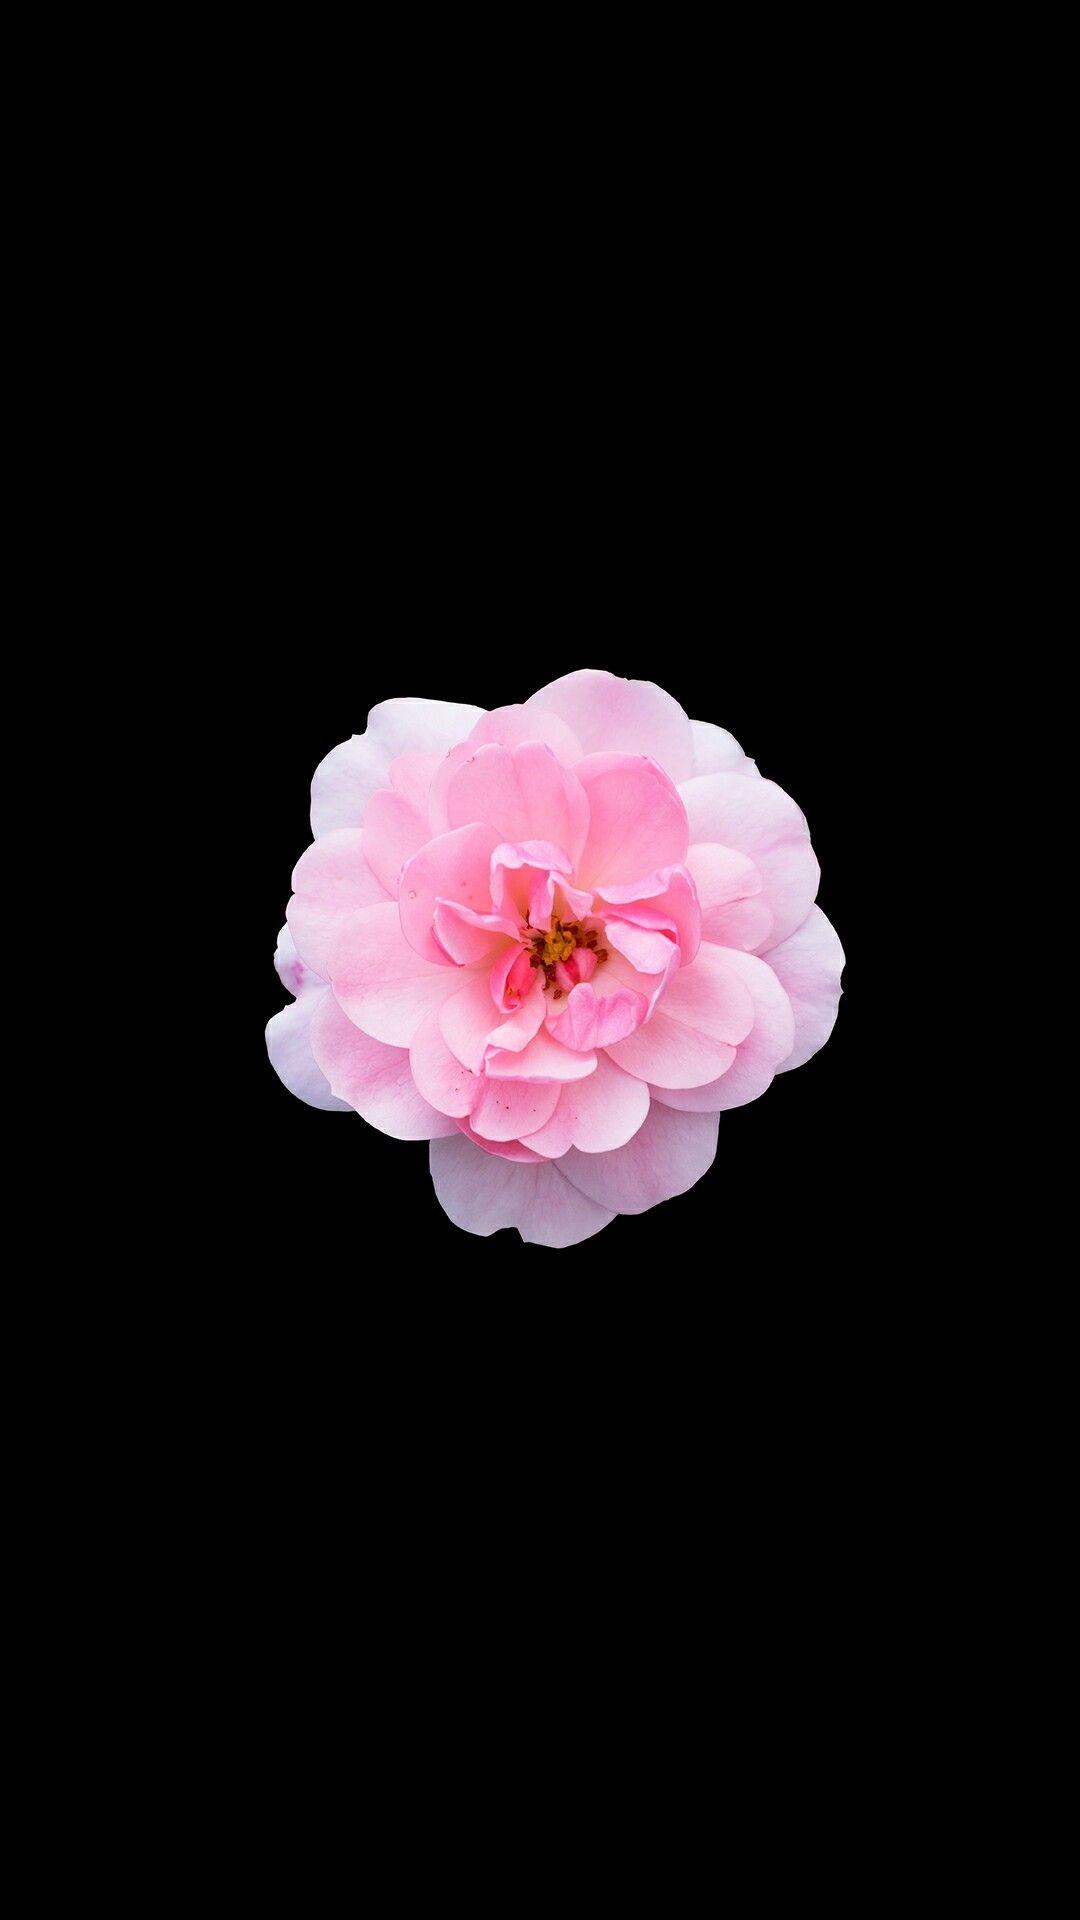 Black Flower Wallpaper 64 images 1080x1920